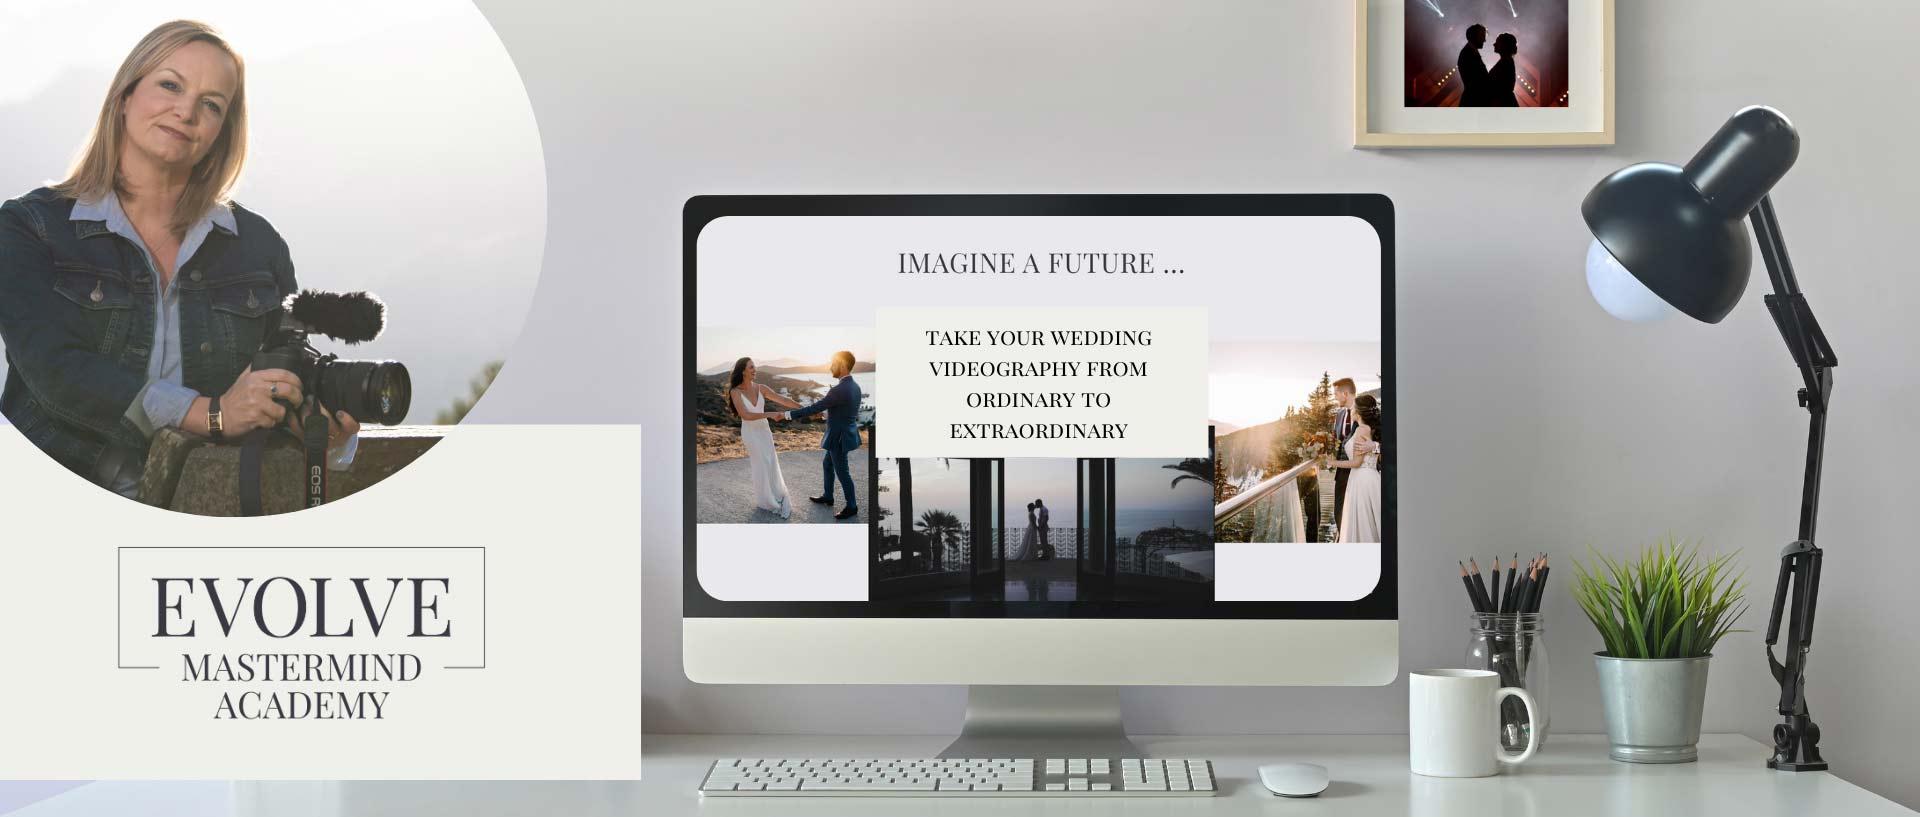 Evolve Mastermind Academy — Online Wedding Video Coaching Community with Emma Wilson